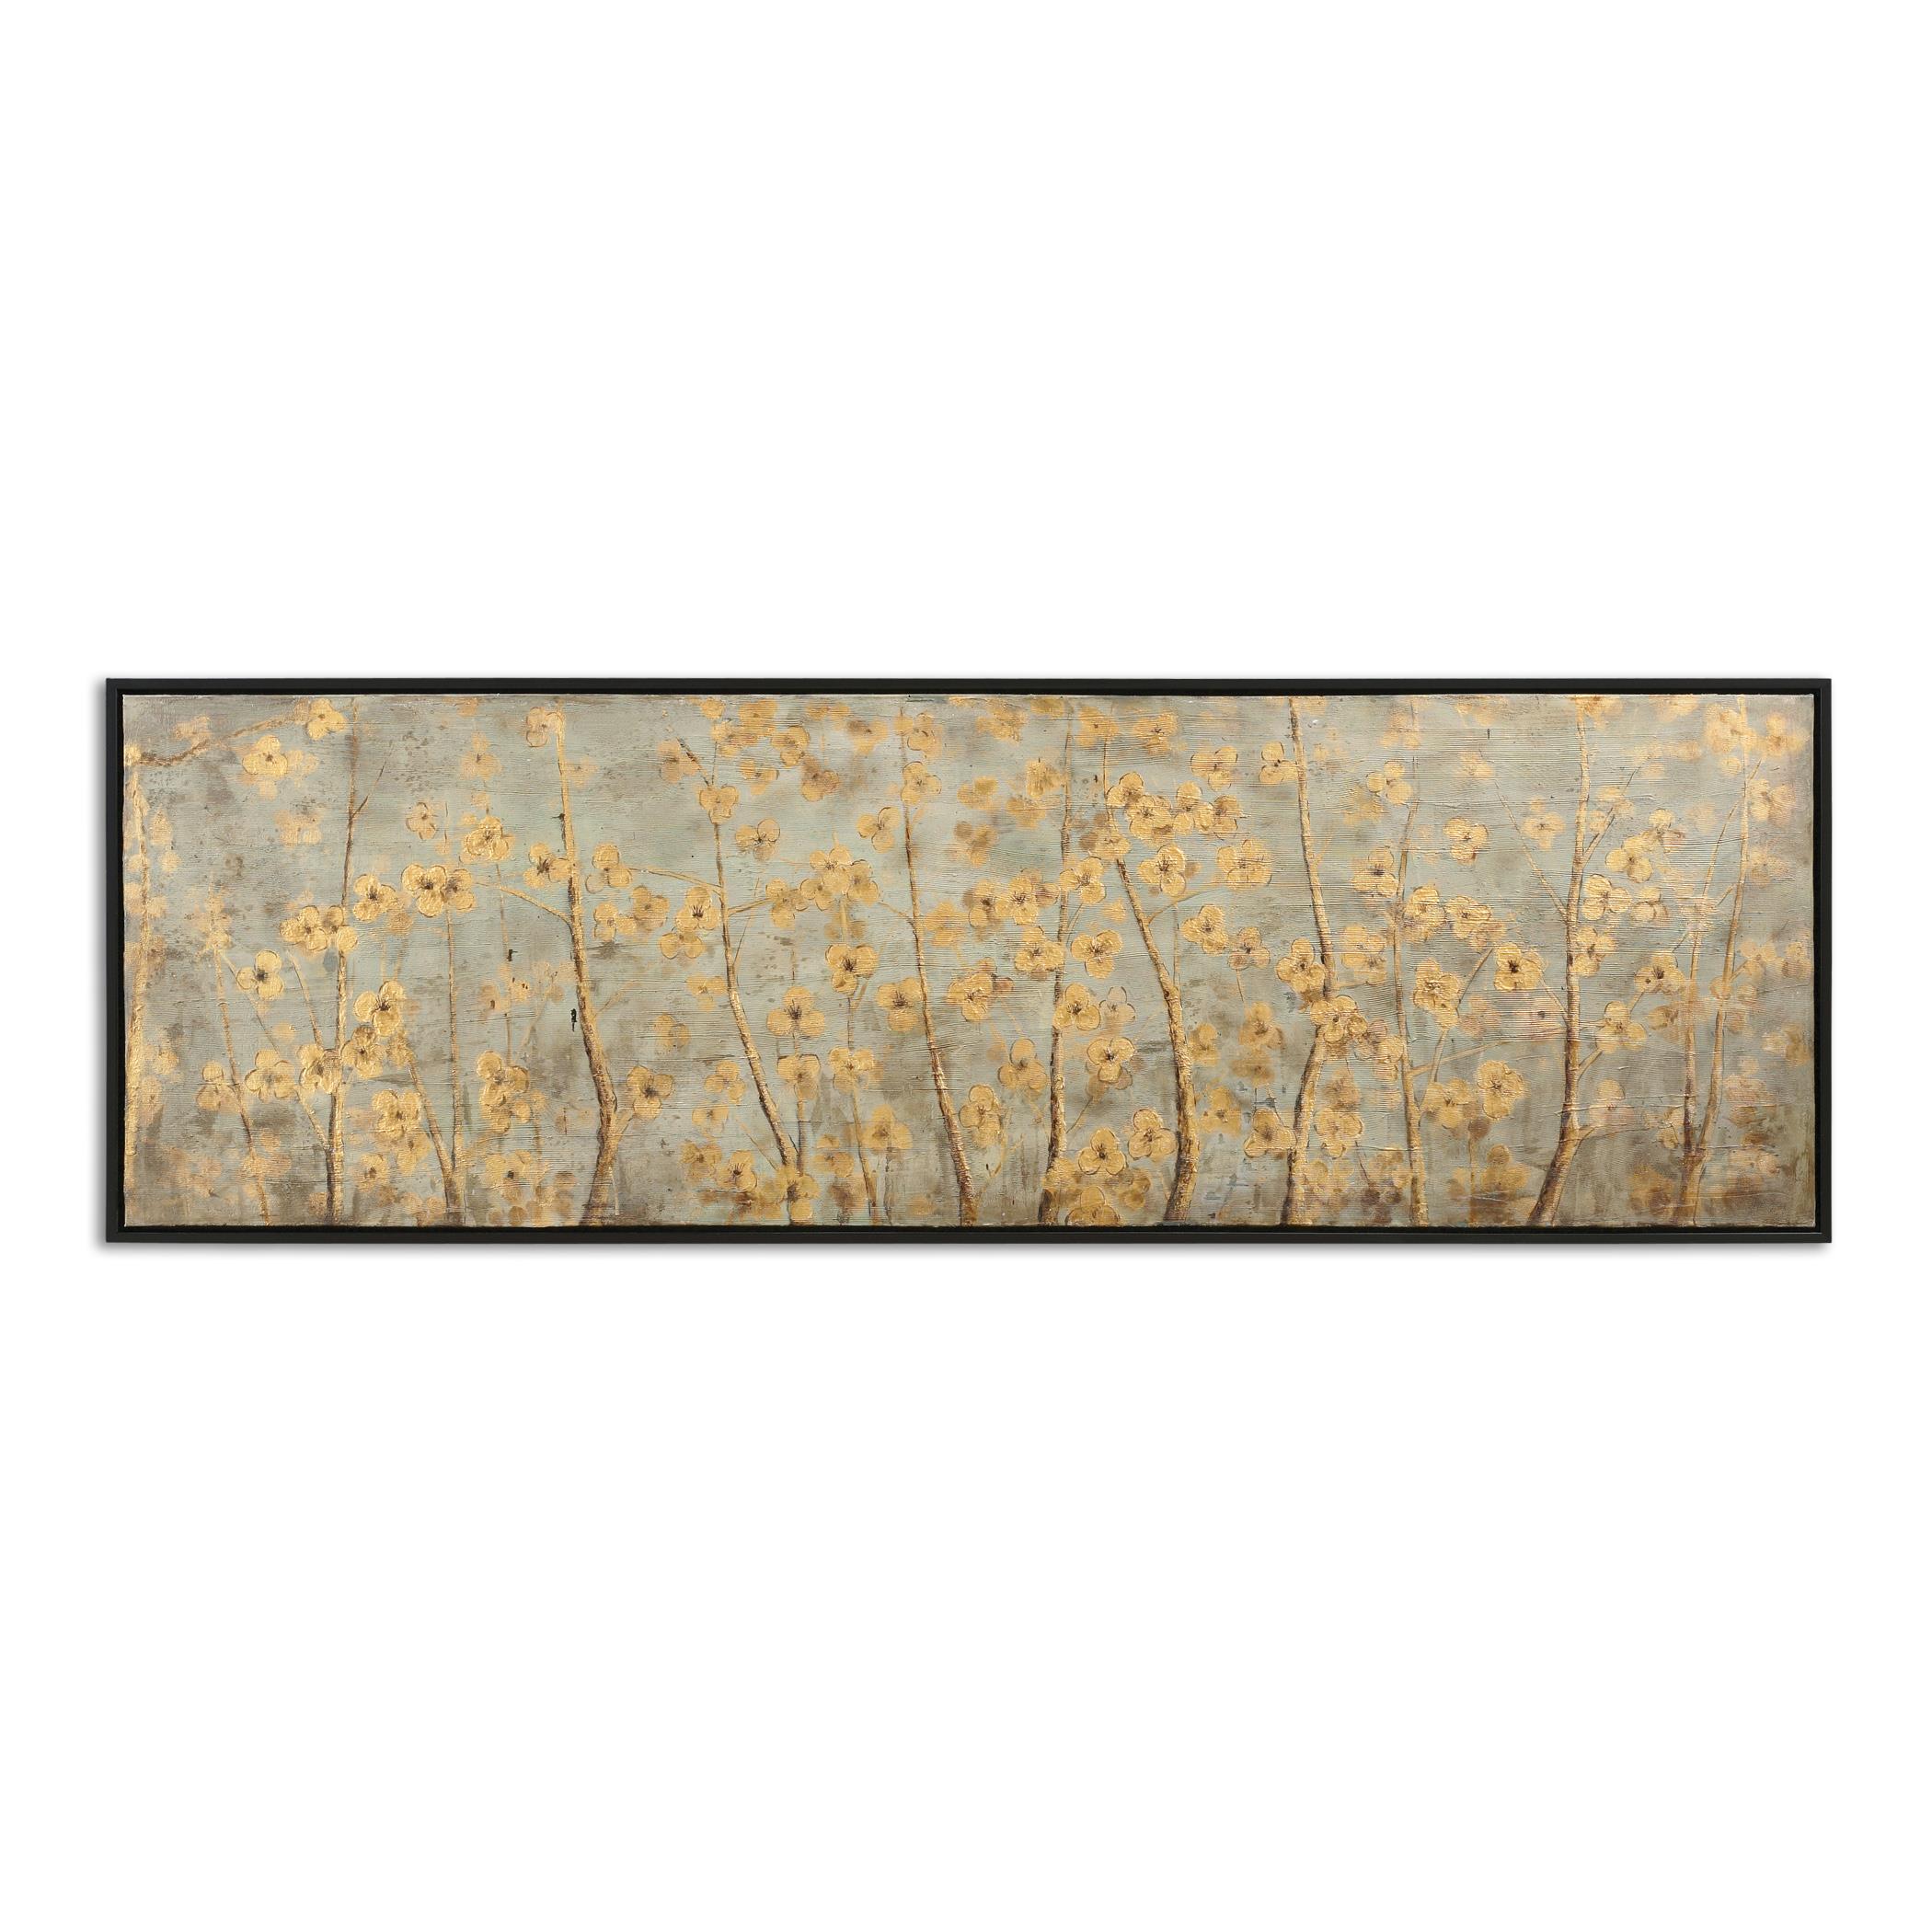 Uttermost Art Festival Of Light Floral Art - Item Number: 31313